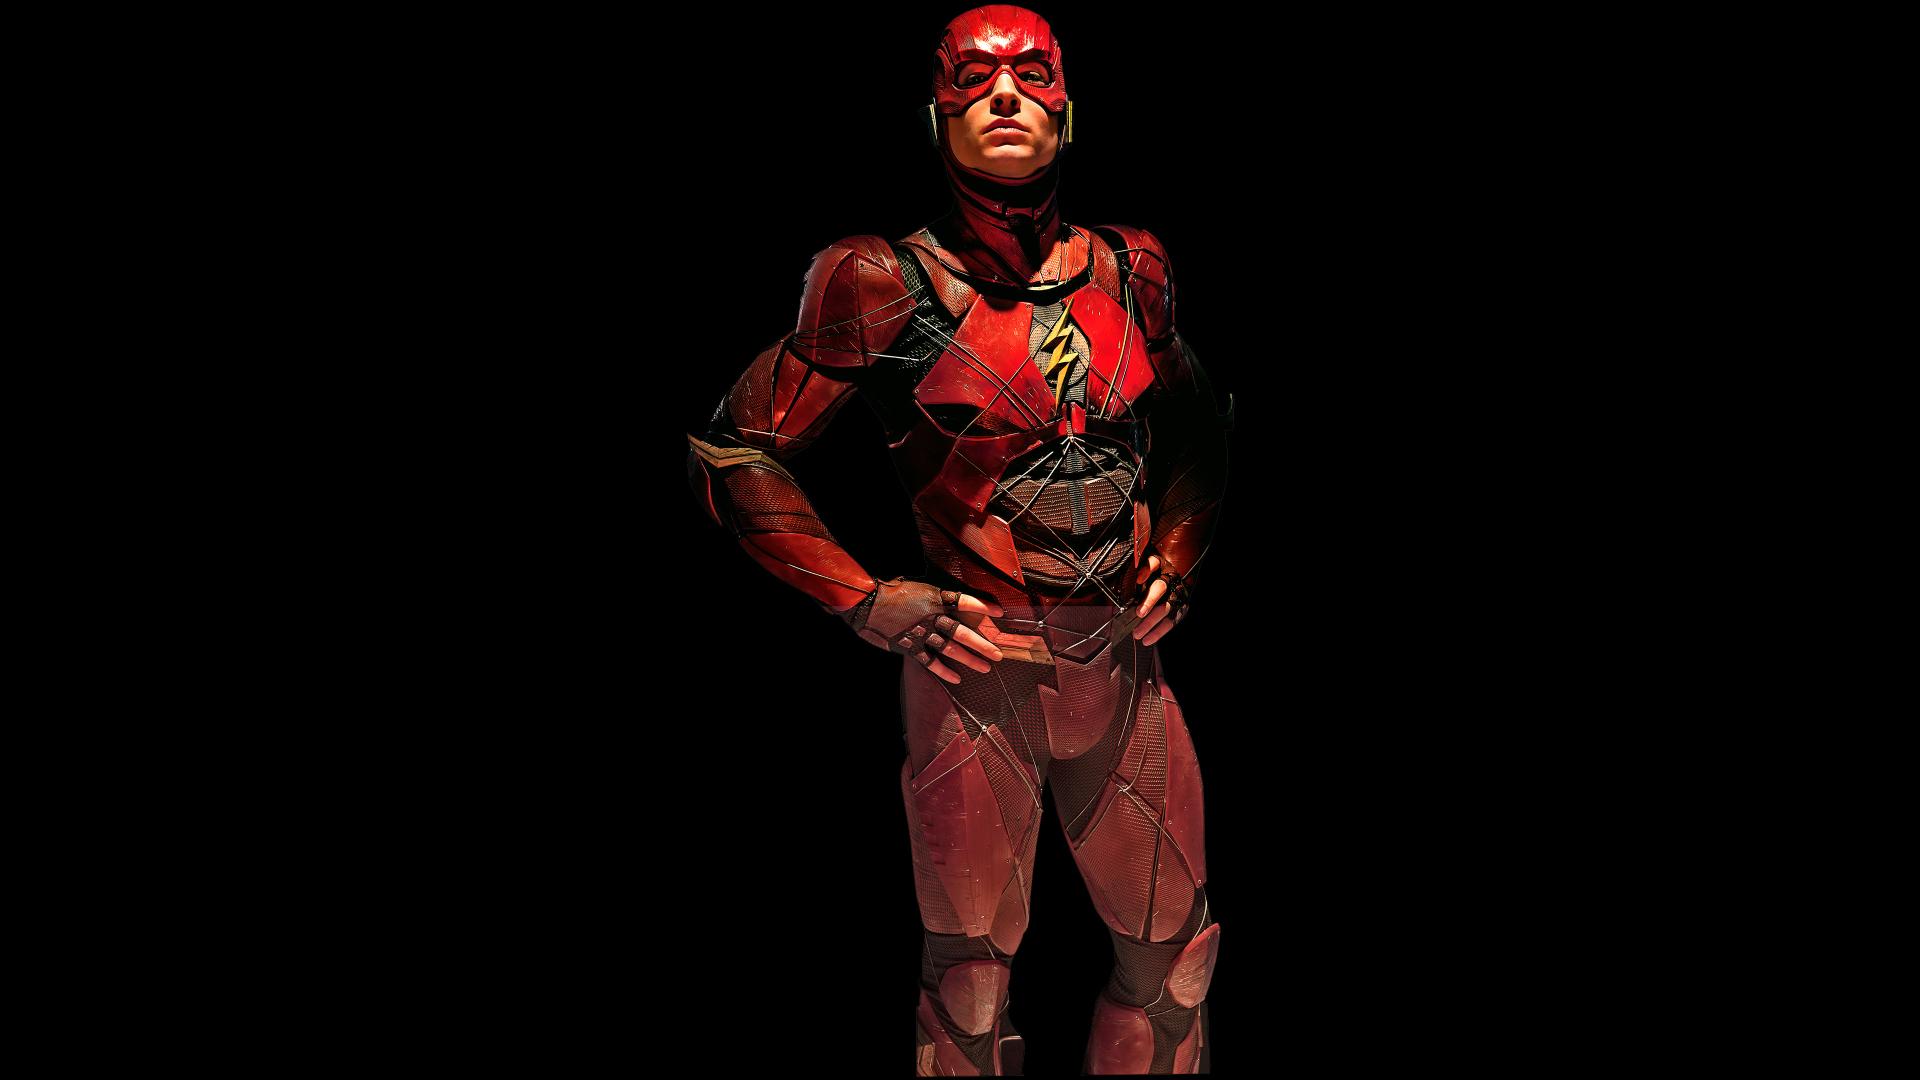 1920x1080 Flash Justice League 1080p Laptop Full Hd Wallpaper Hd